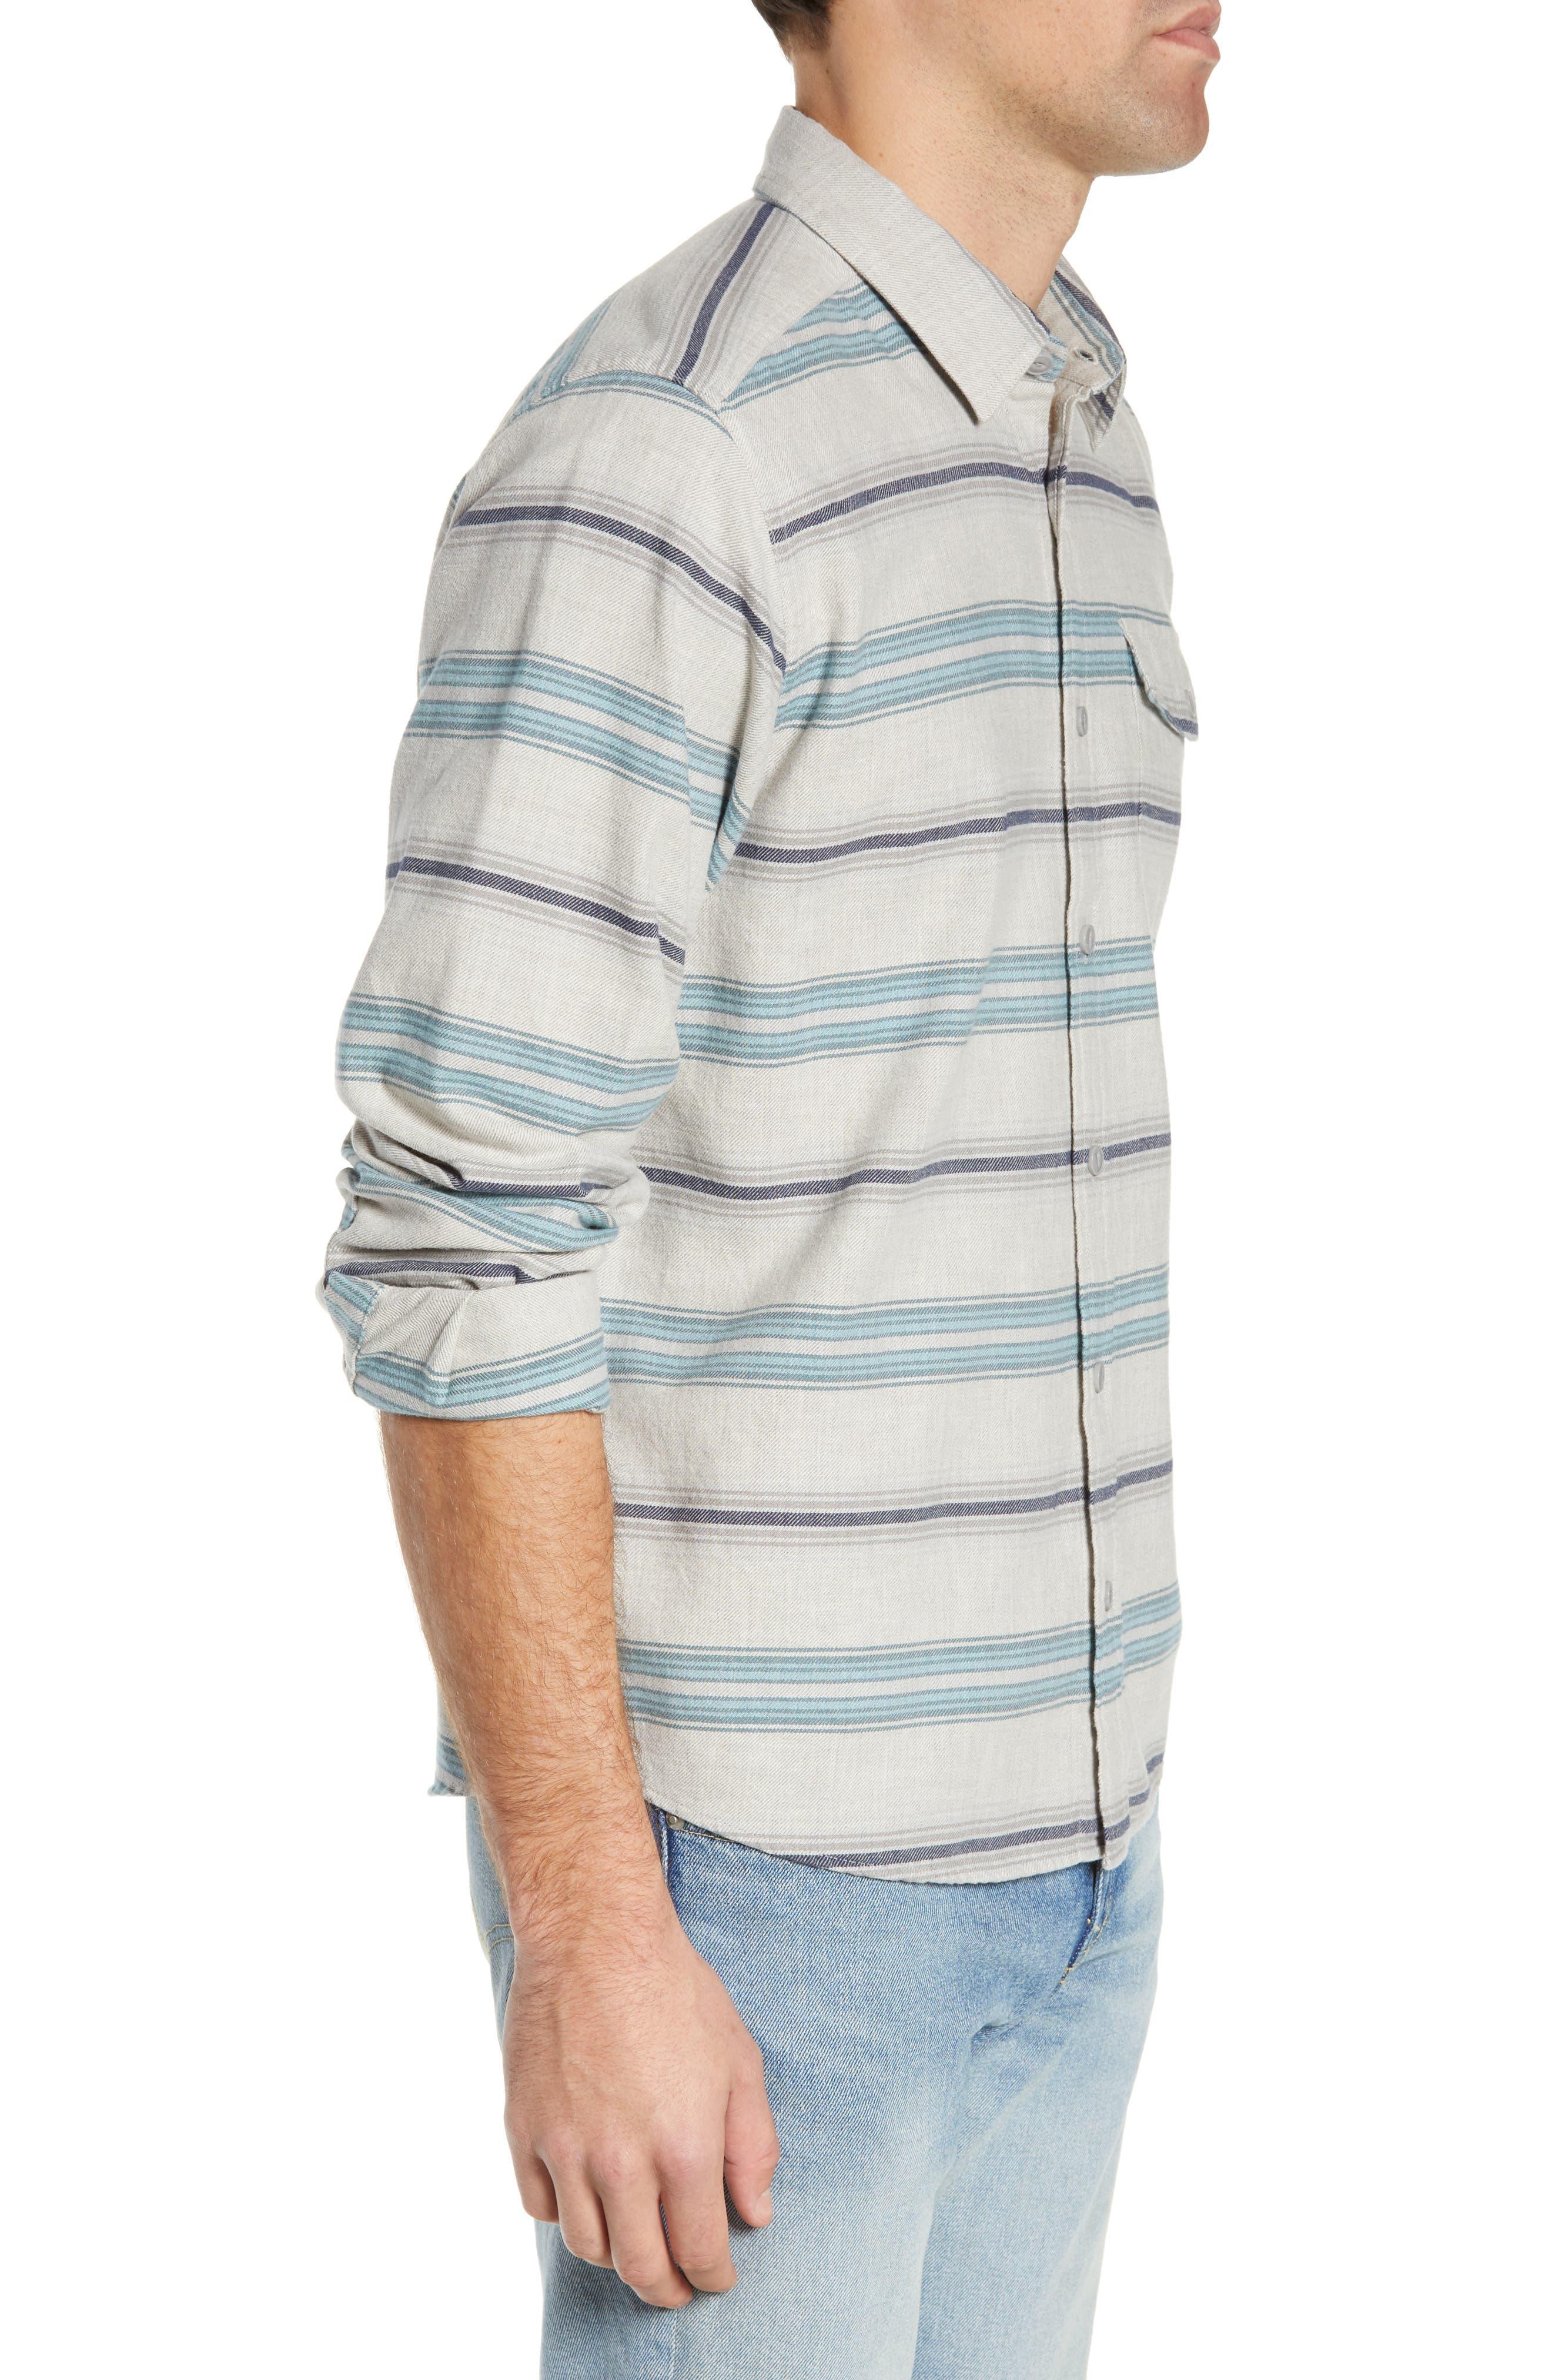 PATAGONIA,                             Regular Fit Organic Cotton Flannel Shirt,                             Alternate thumbnail 4, color,                             TARKINE STRIPE DRIFTER GREY